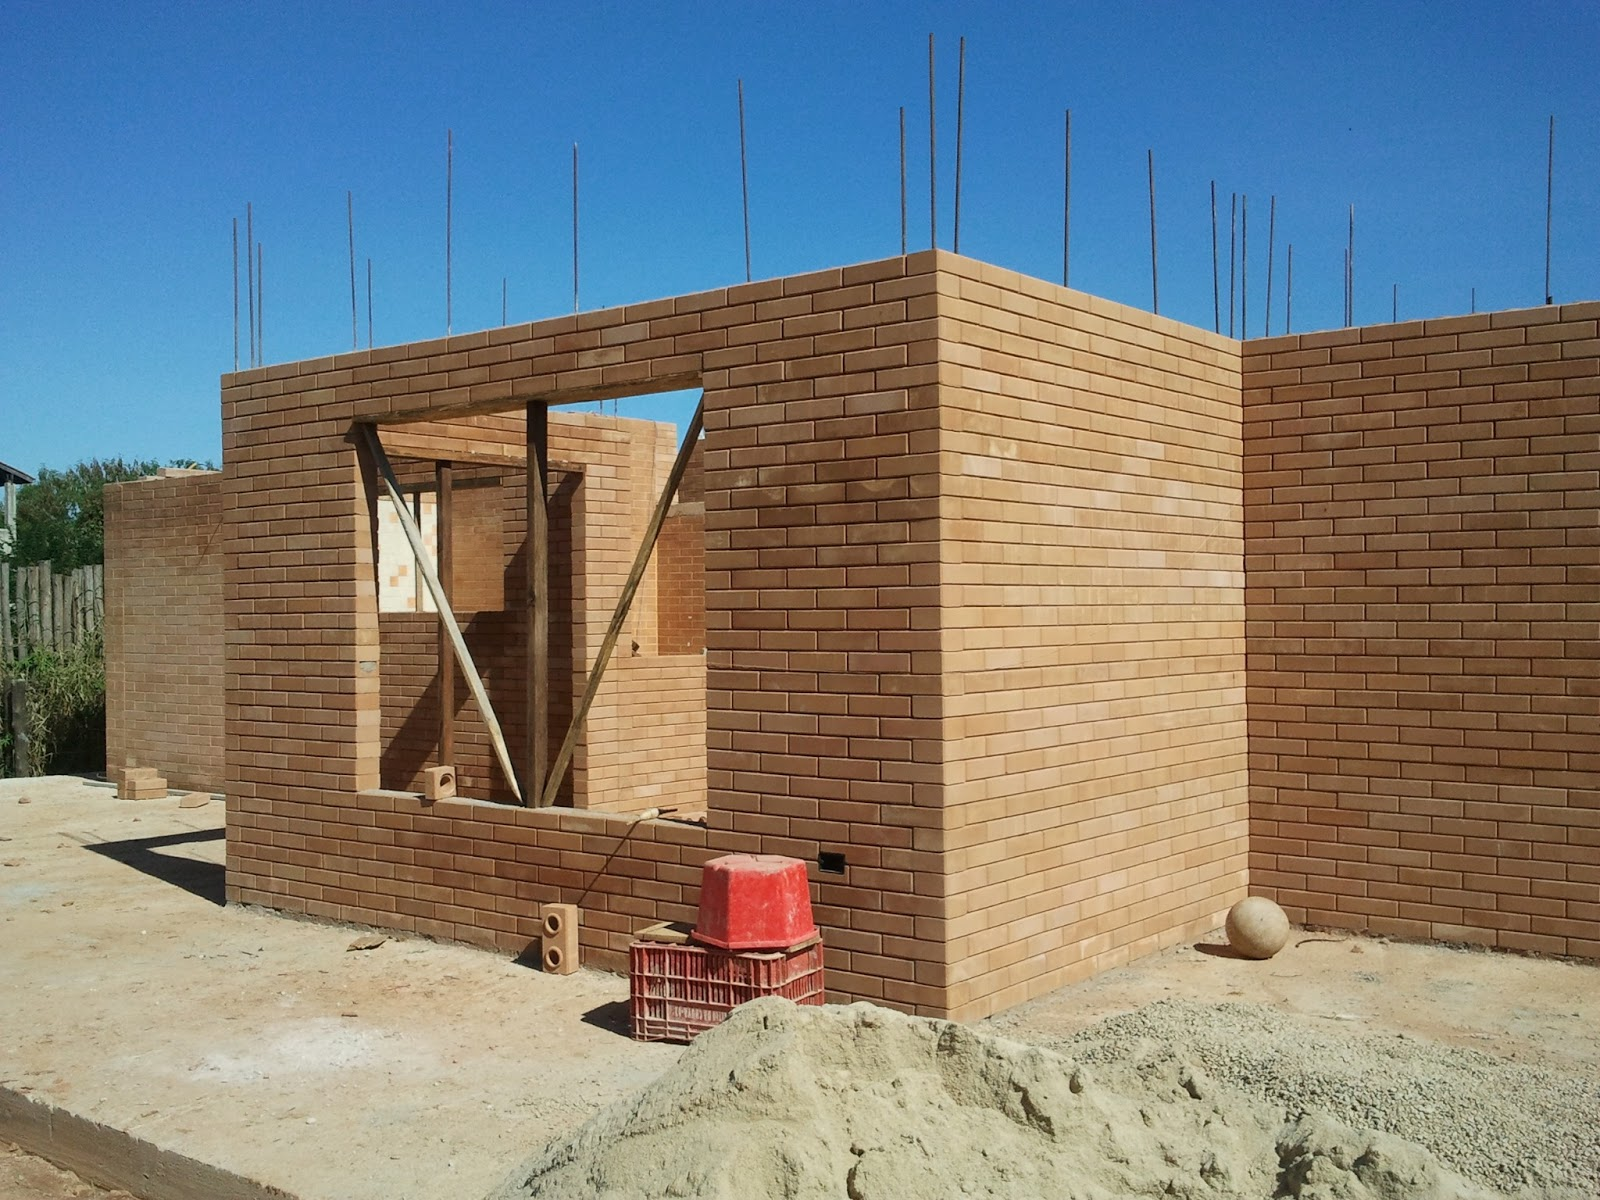 Construindo e Ampliando com Tijolo Solo cimento / Ecológico  #30689B 1600x1200 Banheiro Com Tijolo Ecologico